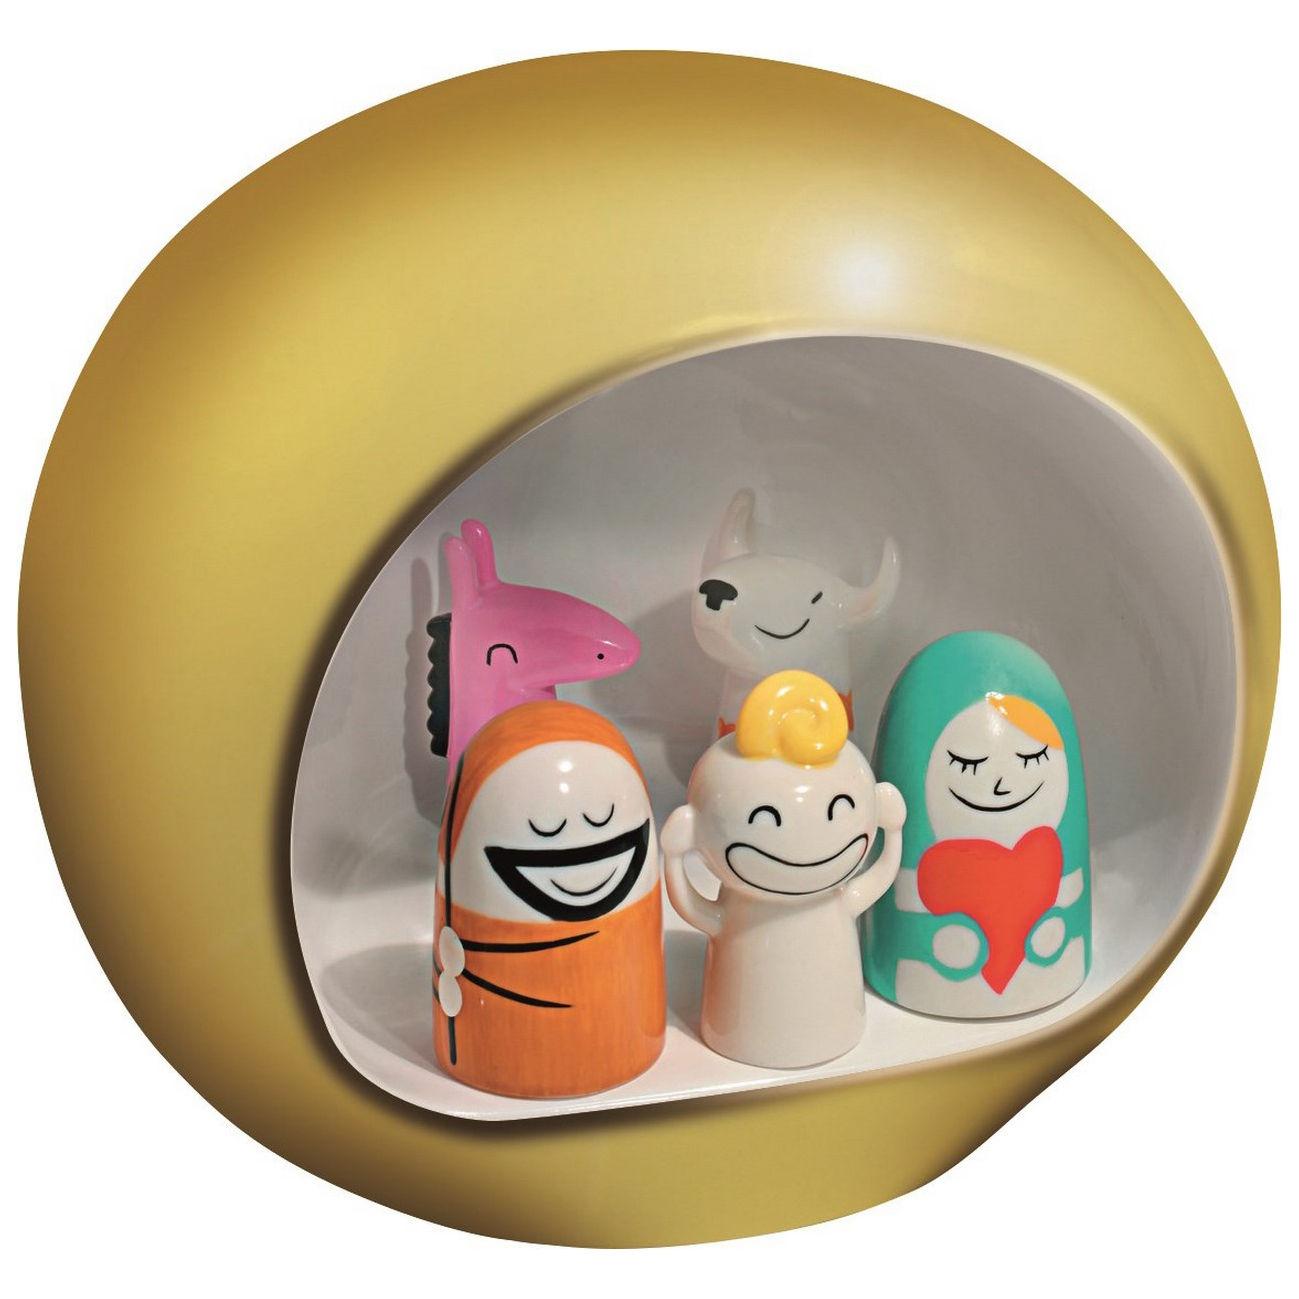 Decoration - Home Accessories - Presepe Crib by A di Alessi - Gold - China